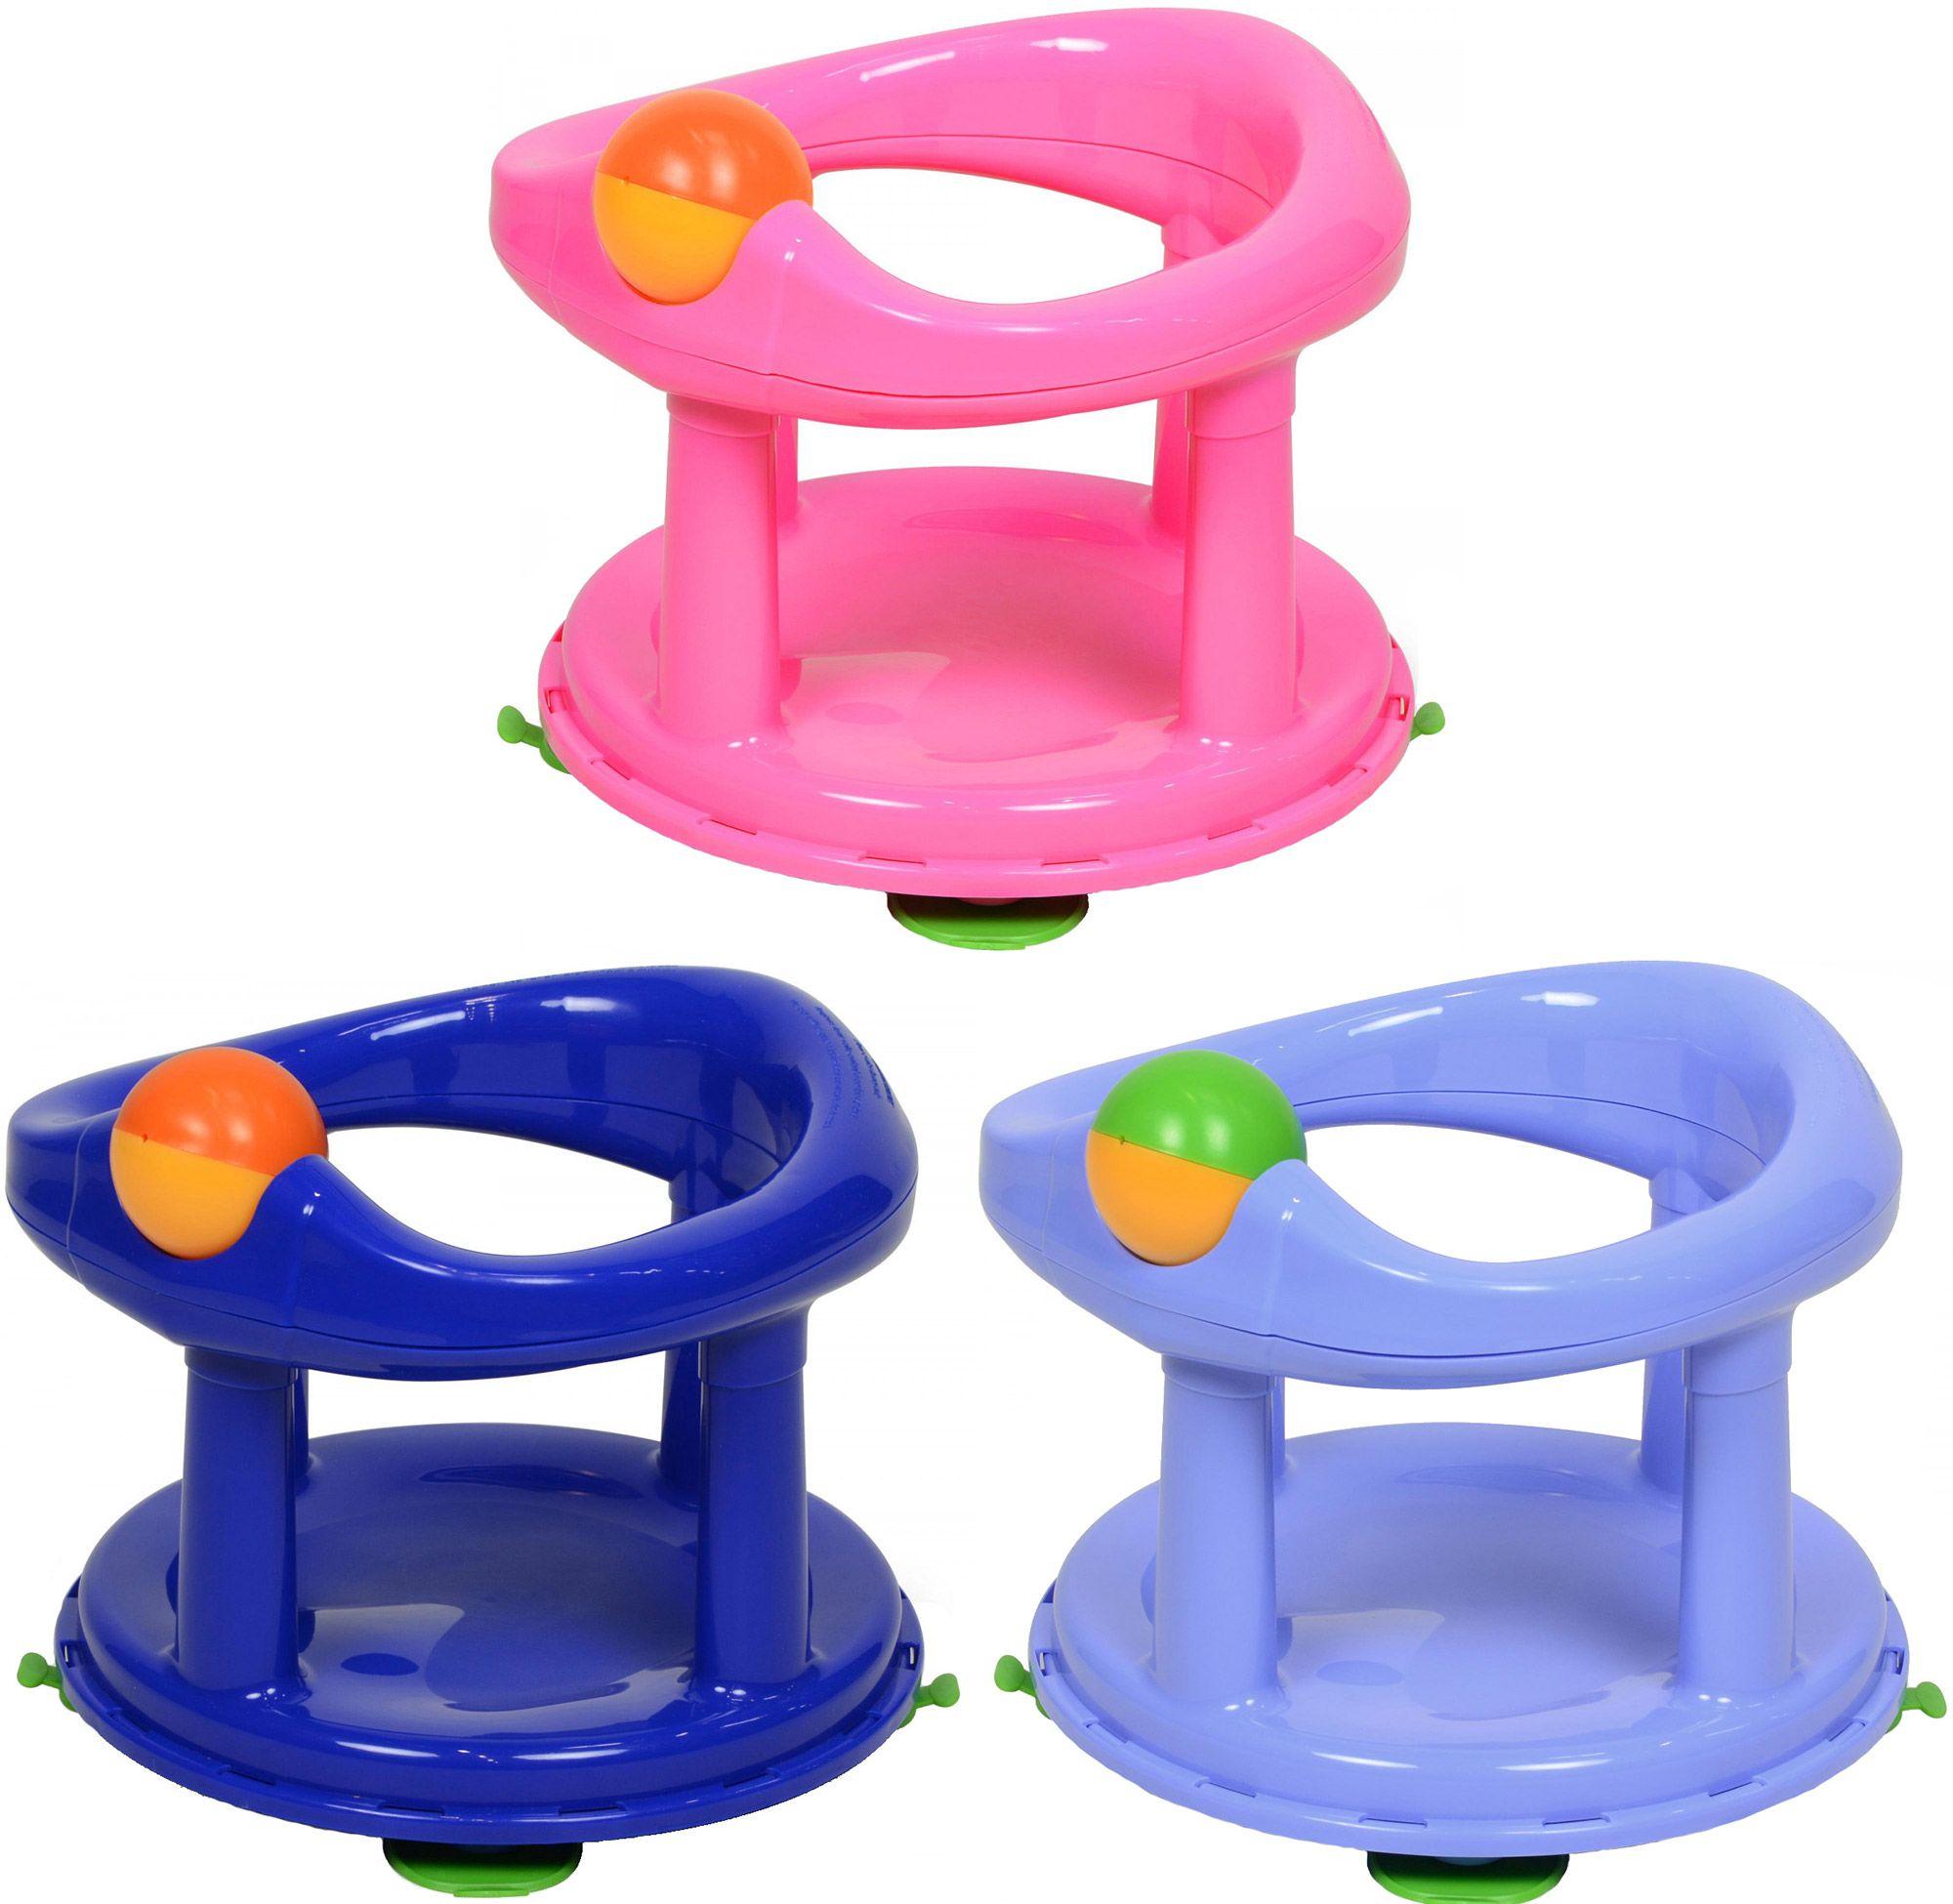 Baby bath chair safety 1st - Safety 1st Swivel Baby Bath Seat Urevoo